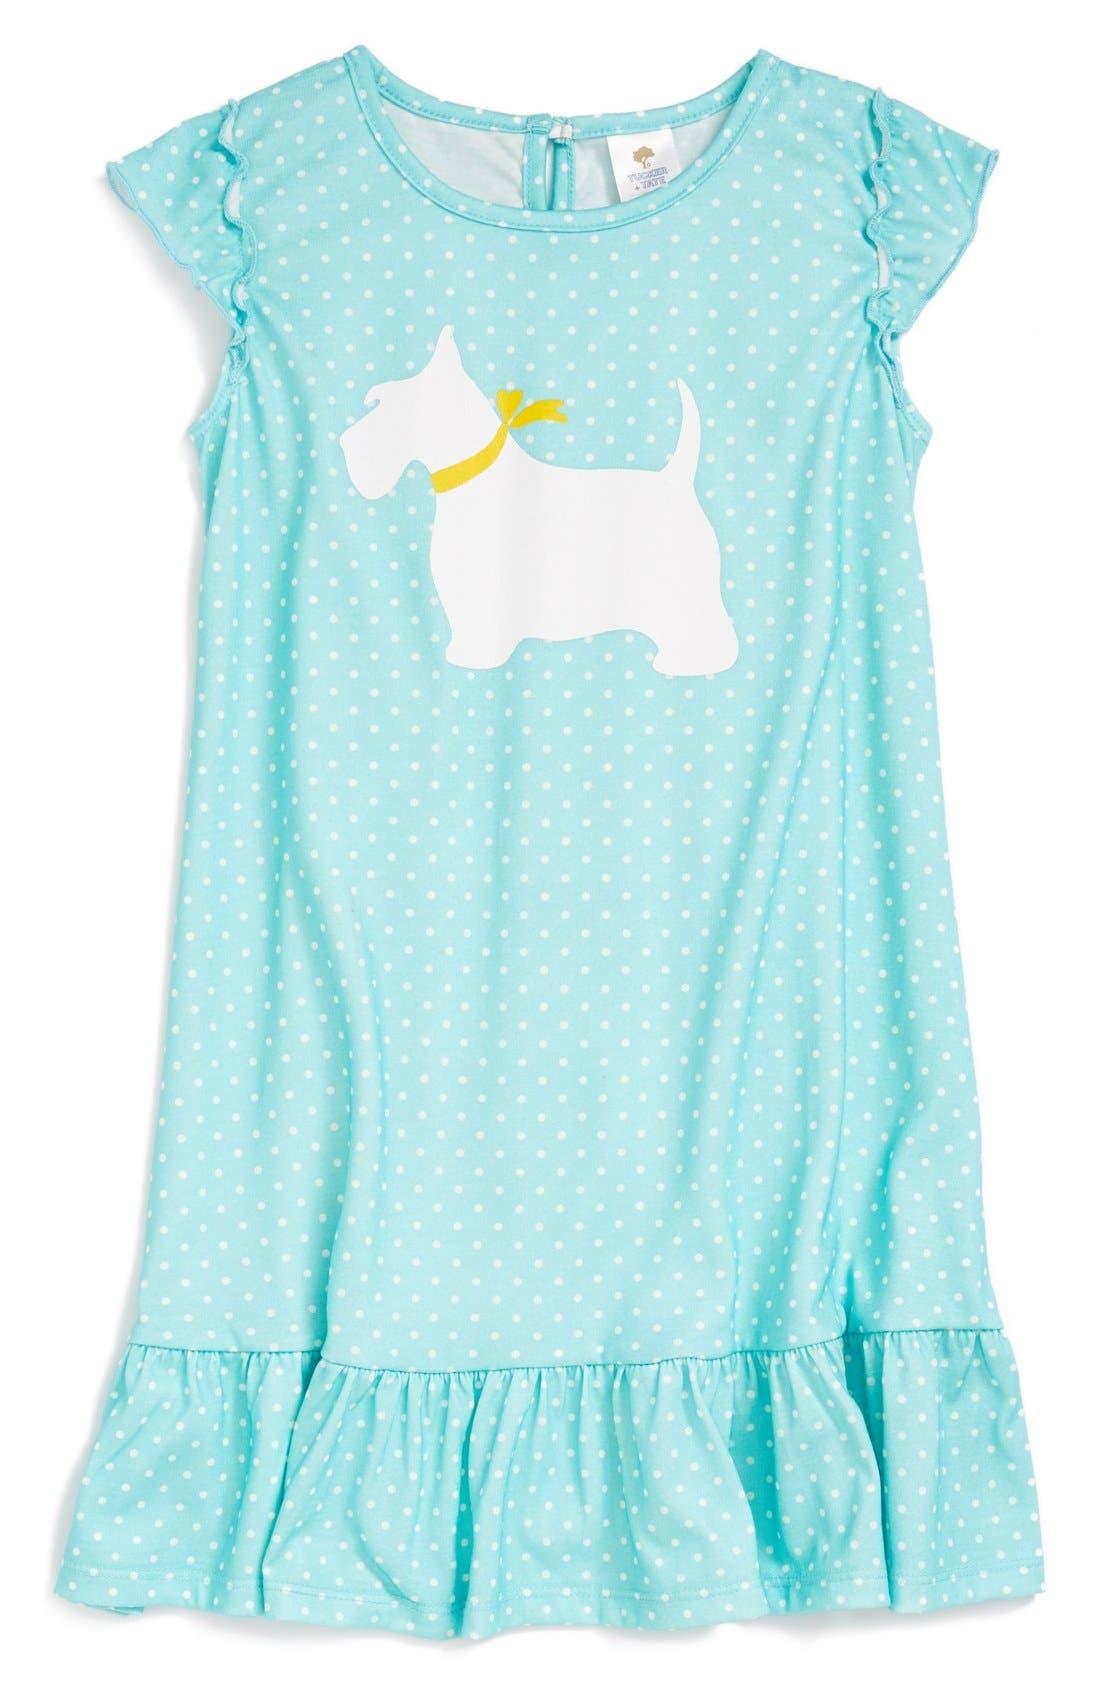 Alternate Image 1 Selected - Tucker + Tate Ruffle Nightgown (Toddler Girls, Little Girls & Big Girls)